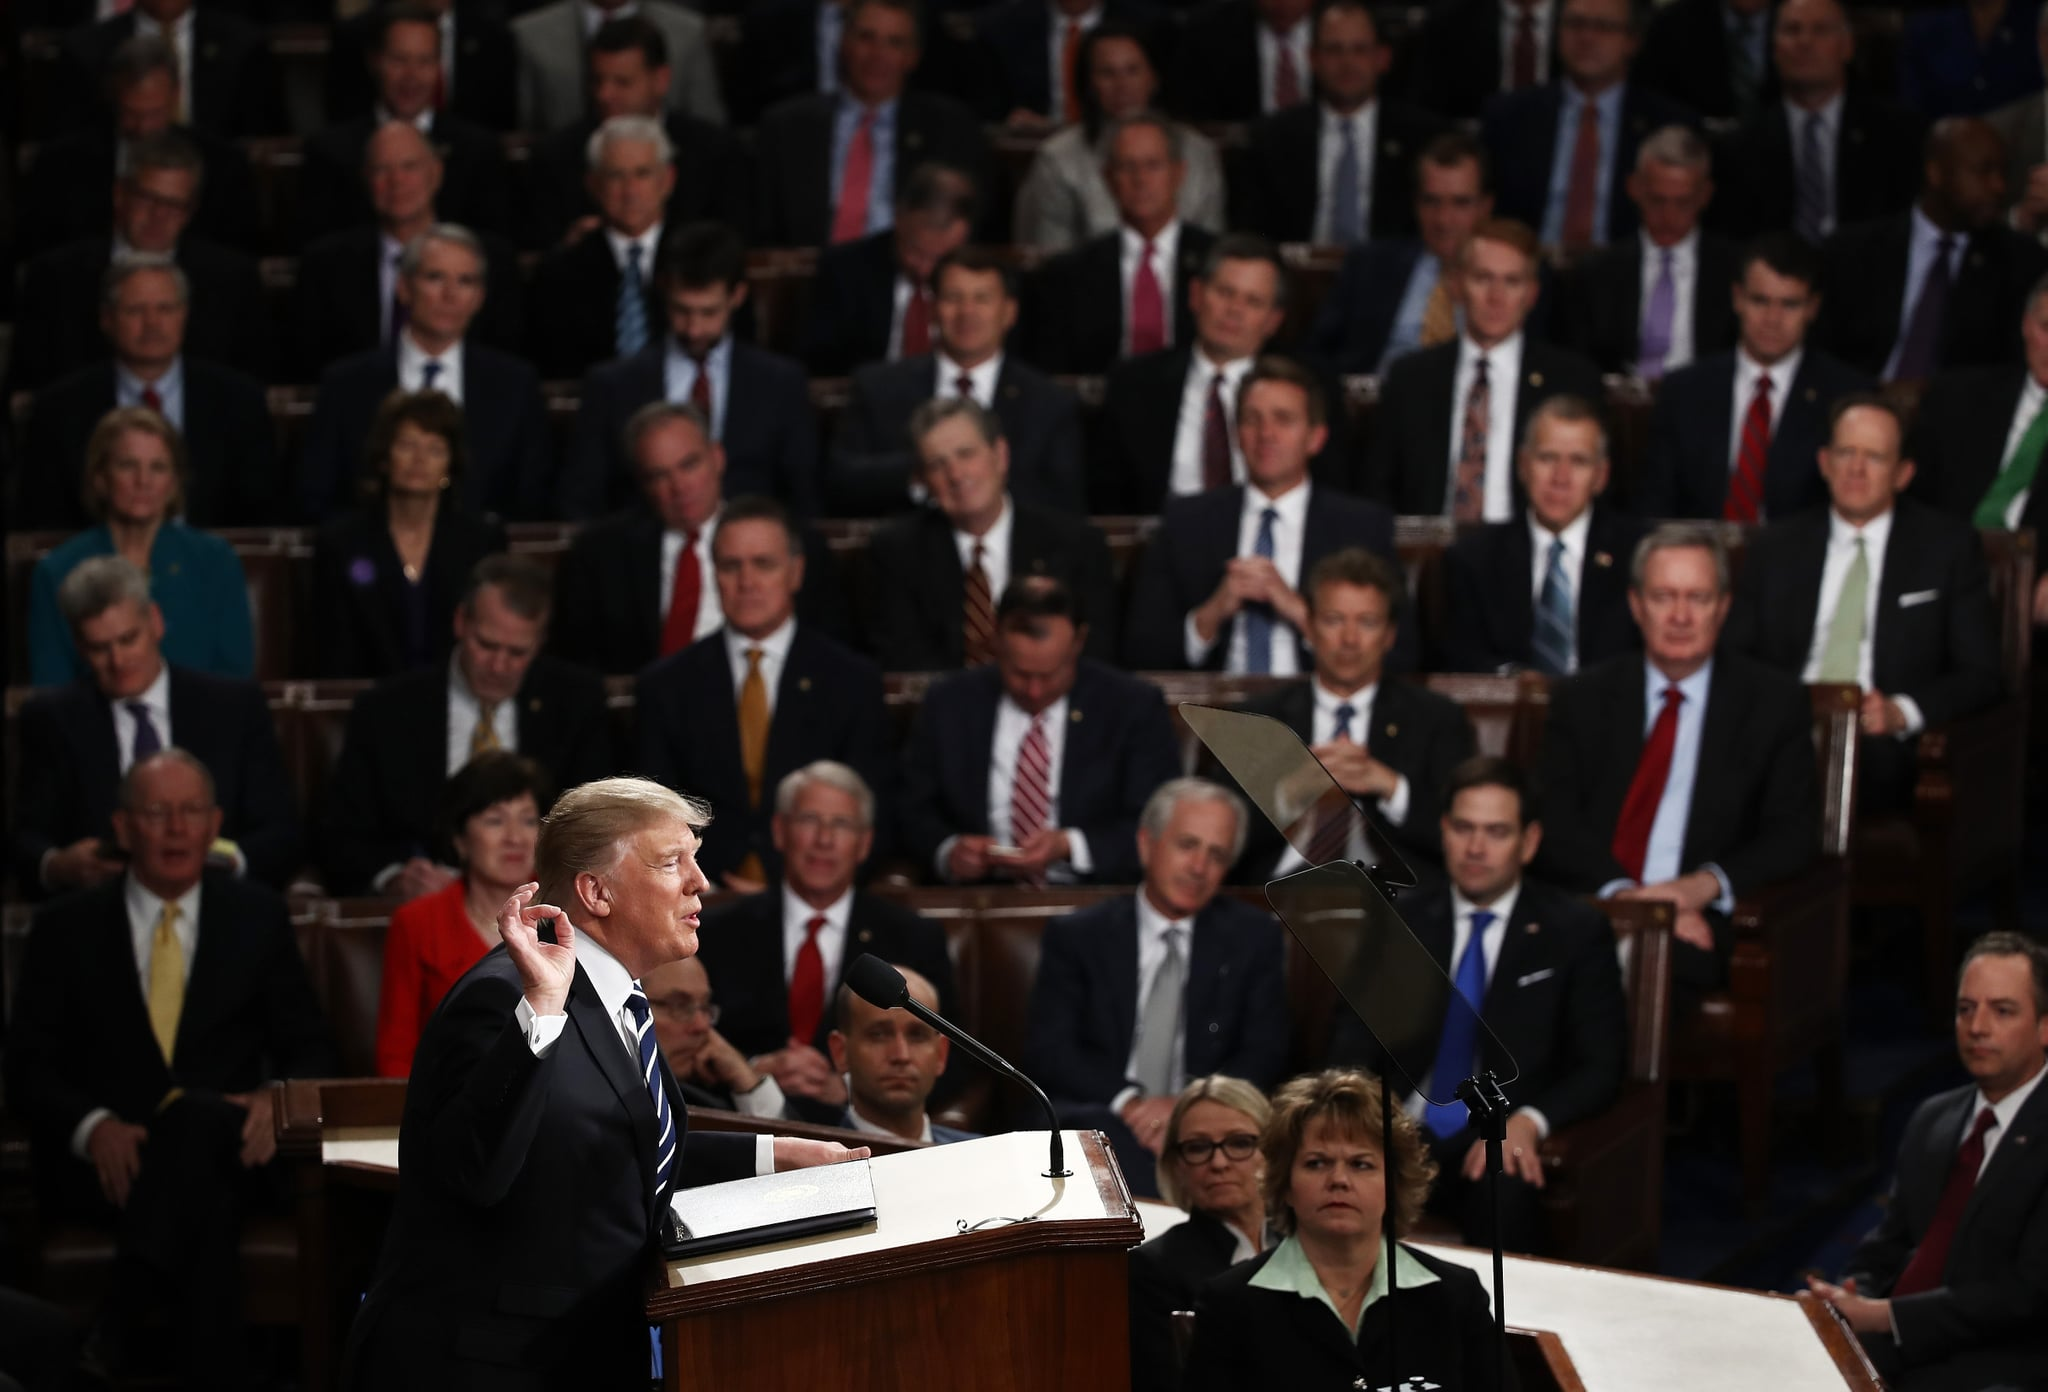 Rep. Joe Kennedy to Deliver Dem Response to Trump's SOTU